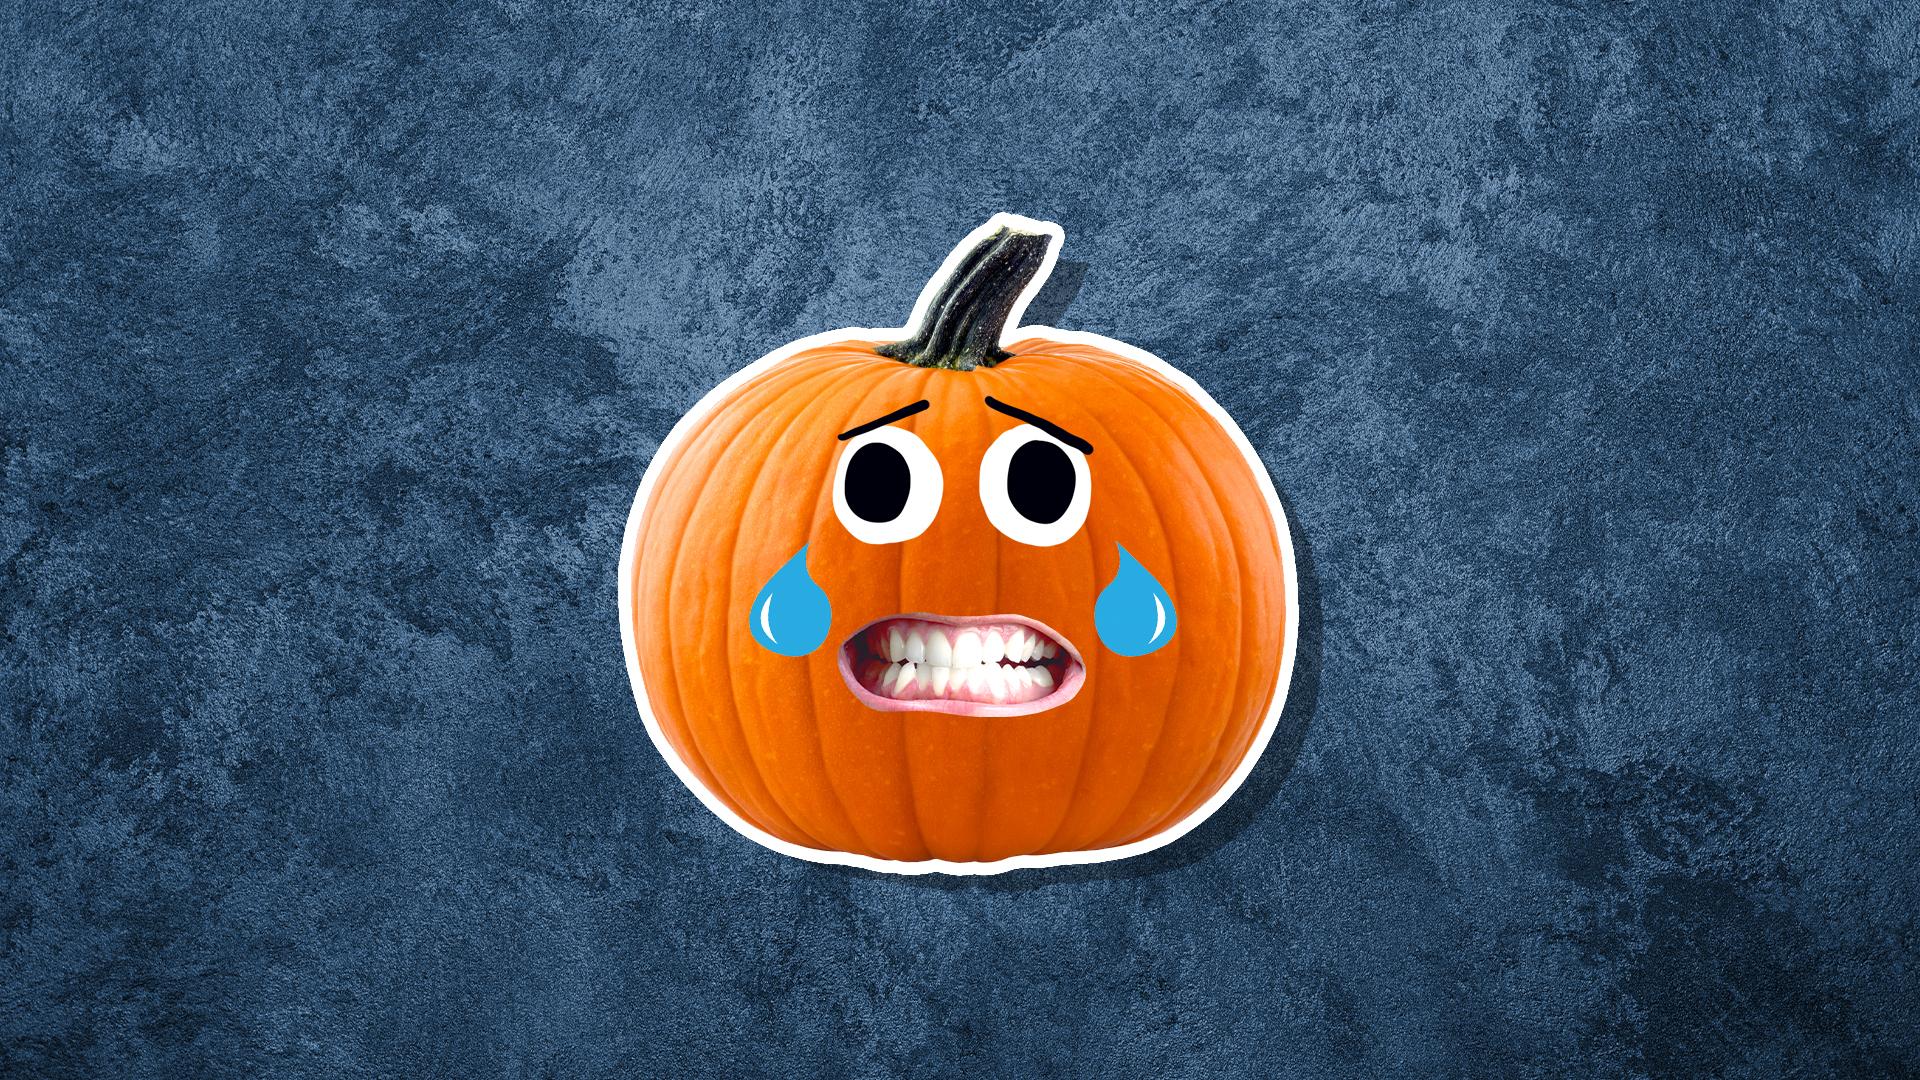 a crying pumpkin